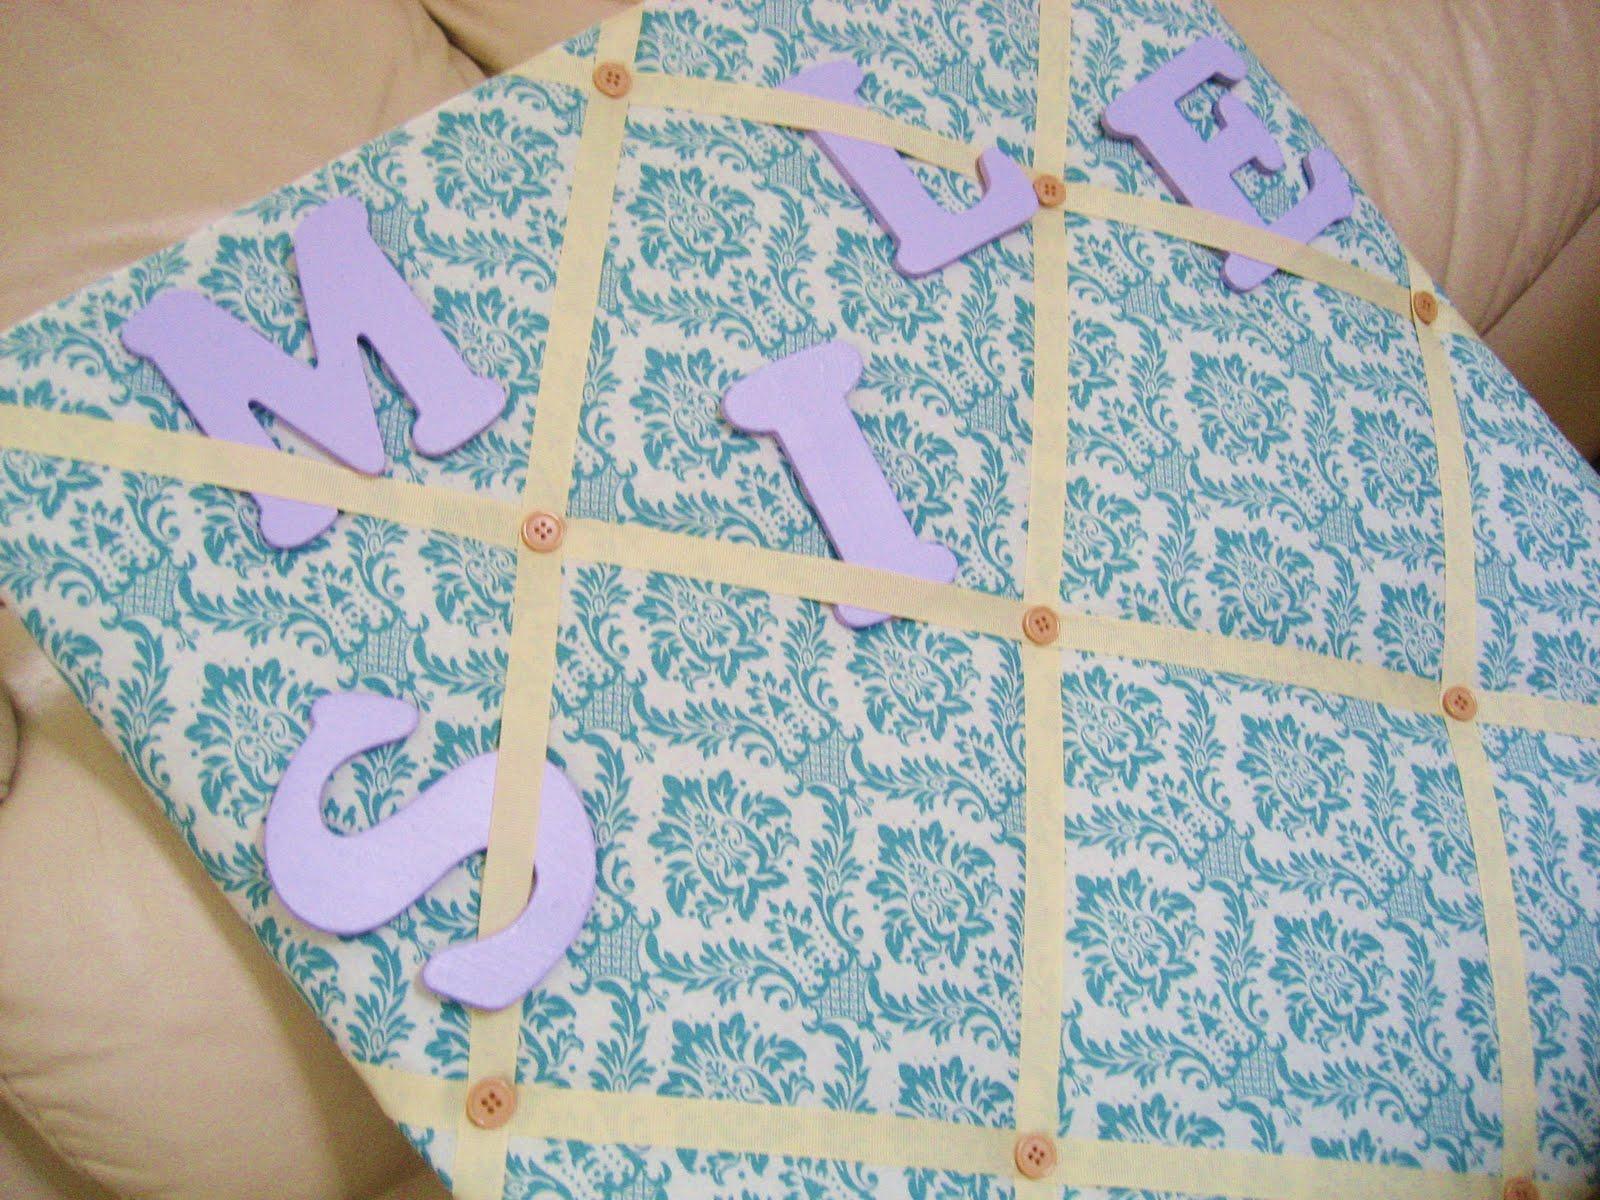 Motherhood For Dummies How To Make A Memory Board